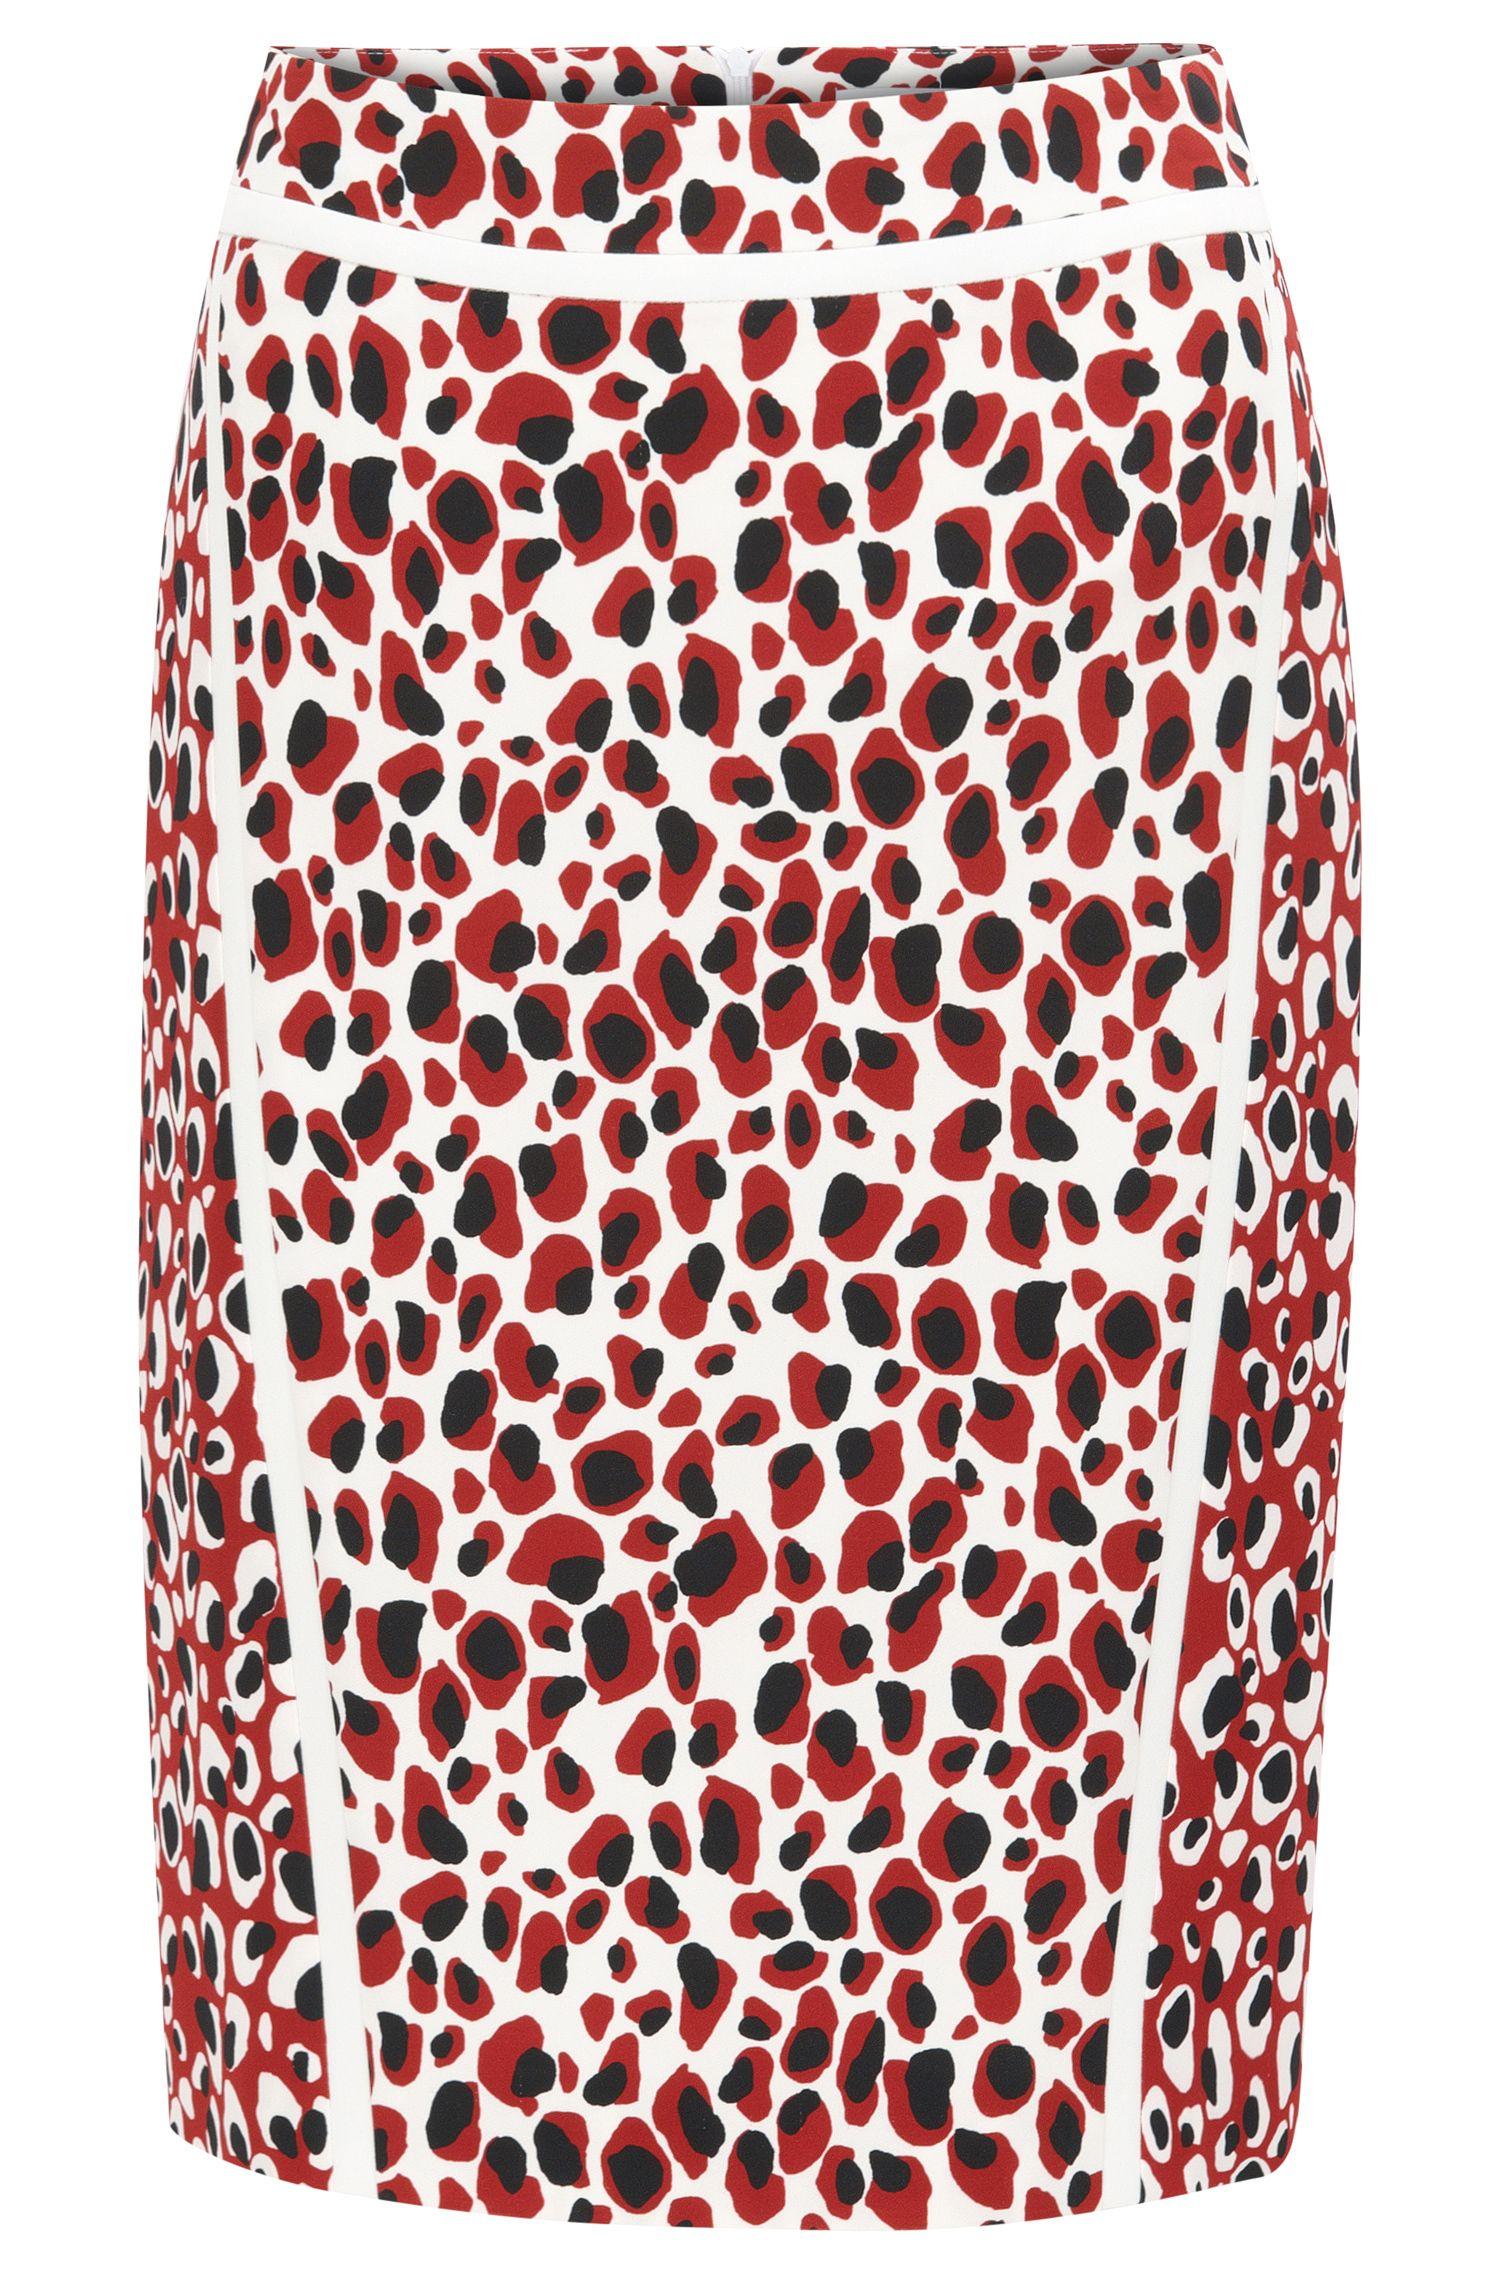 Slim-fit pencil skirt in mixed leopard print